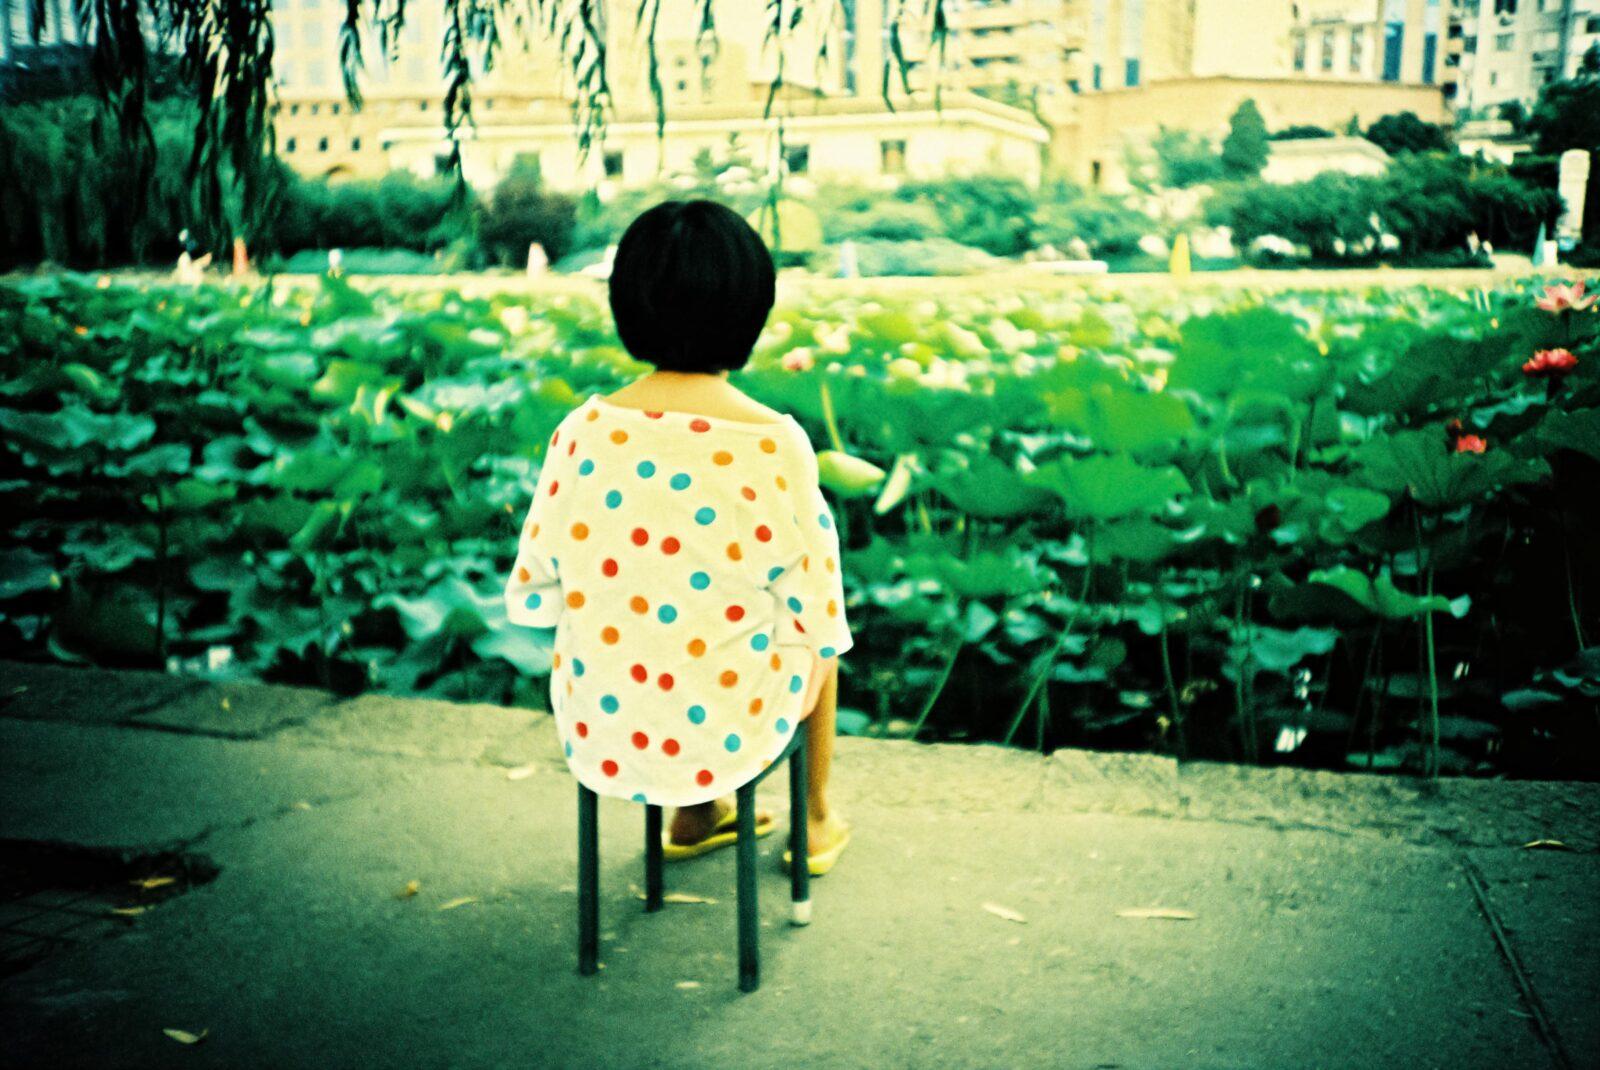 instaCDV 15 China roll02 BeijingHood 000013